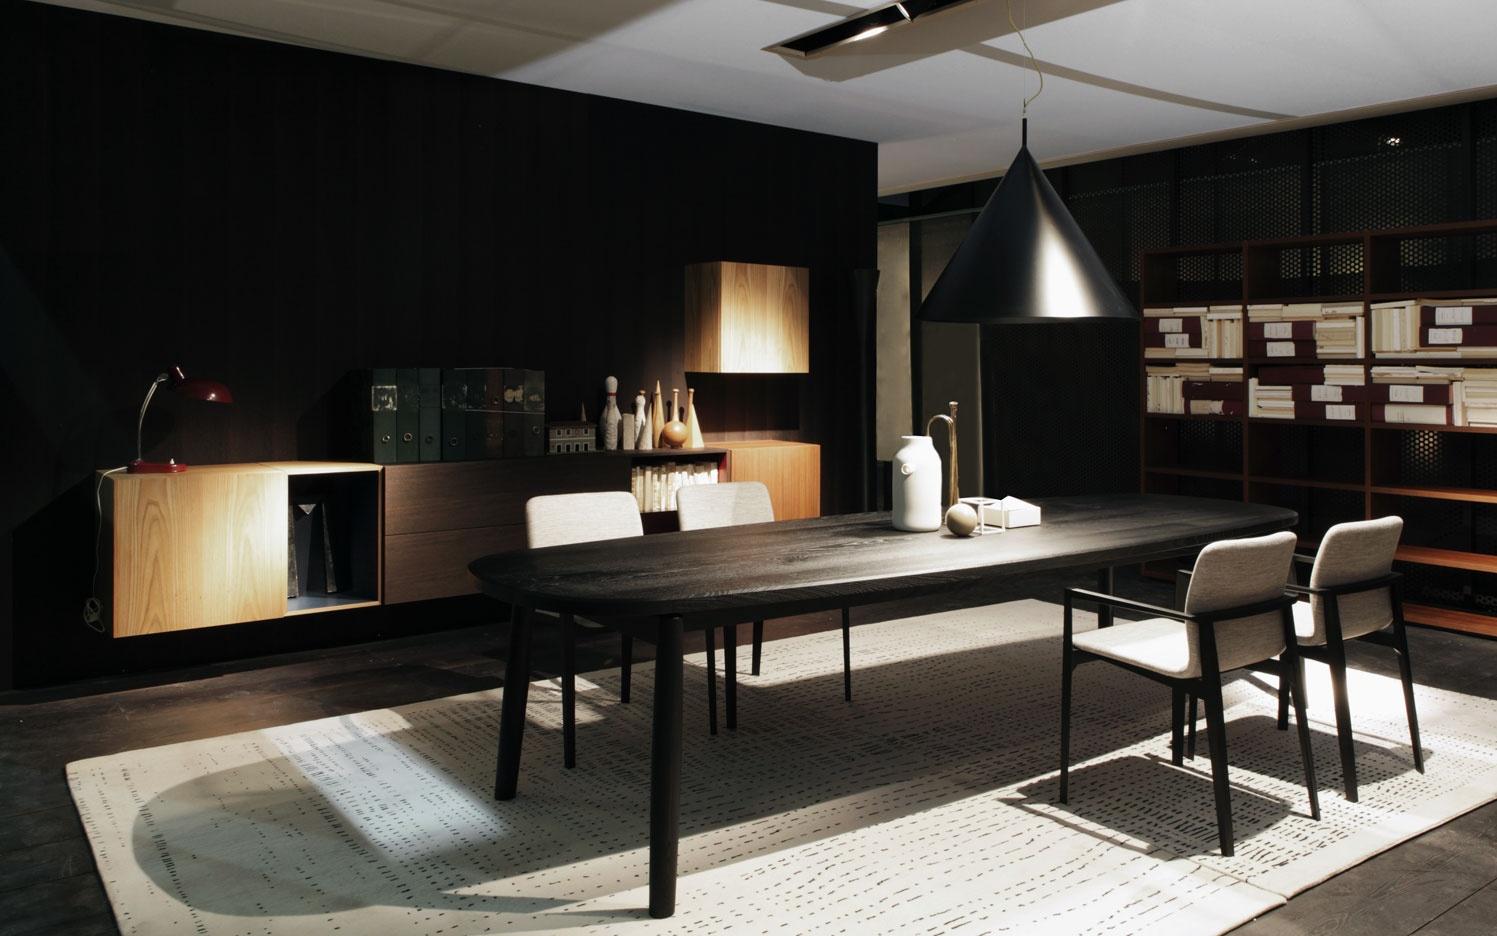 top italian furniture brands porro imagenews immagini porro spa porro dining room best italian furniture